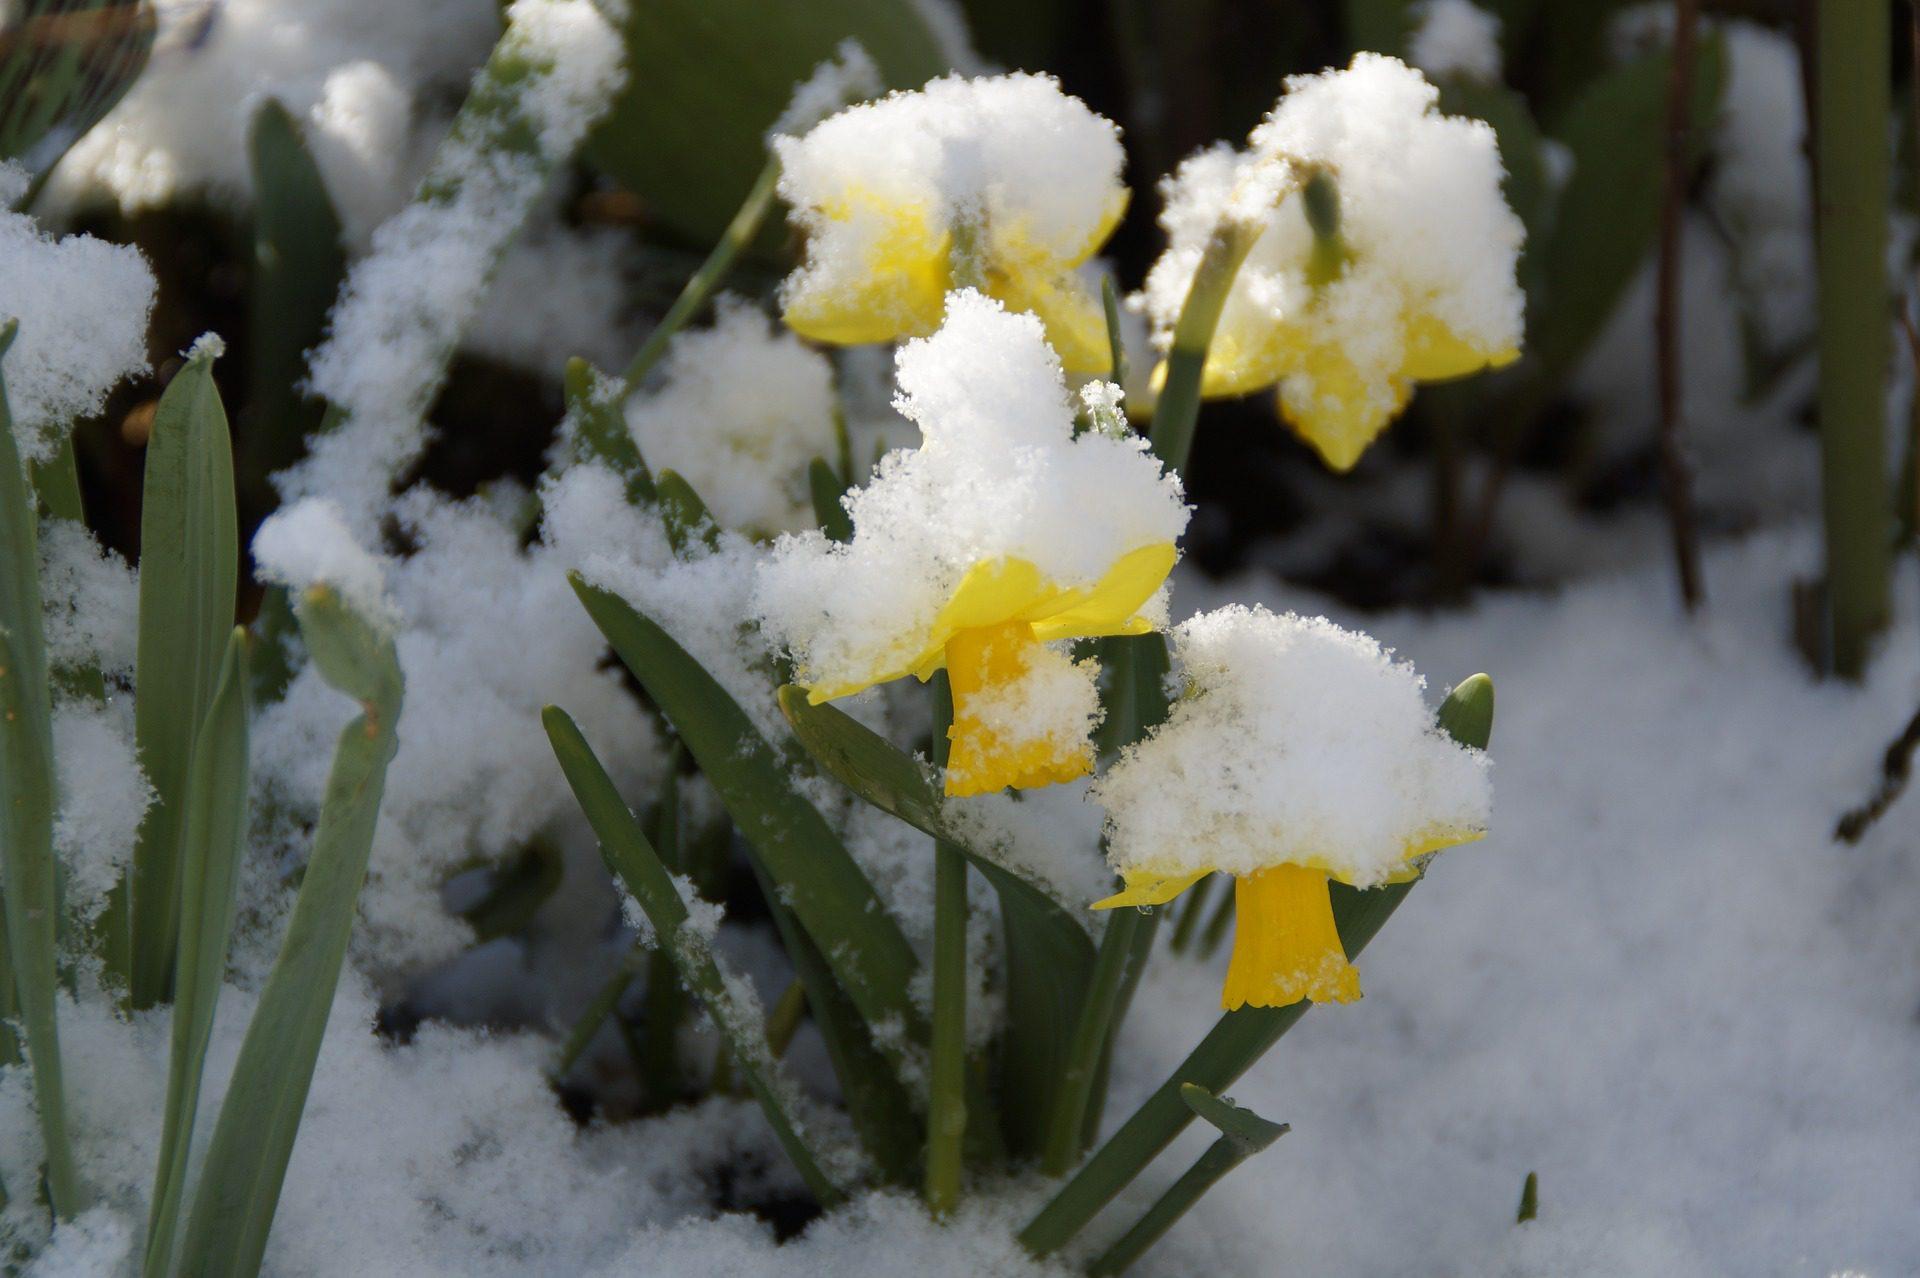 snow on flowers